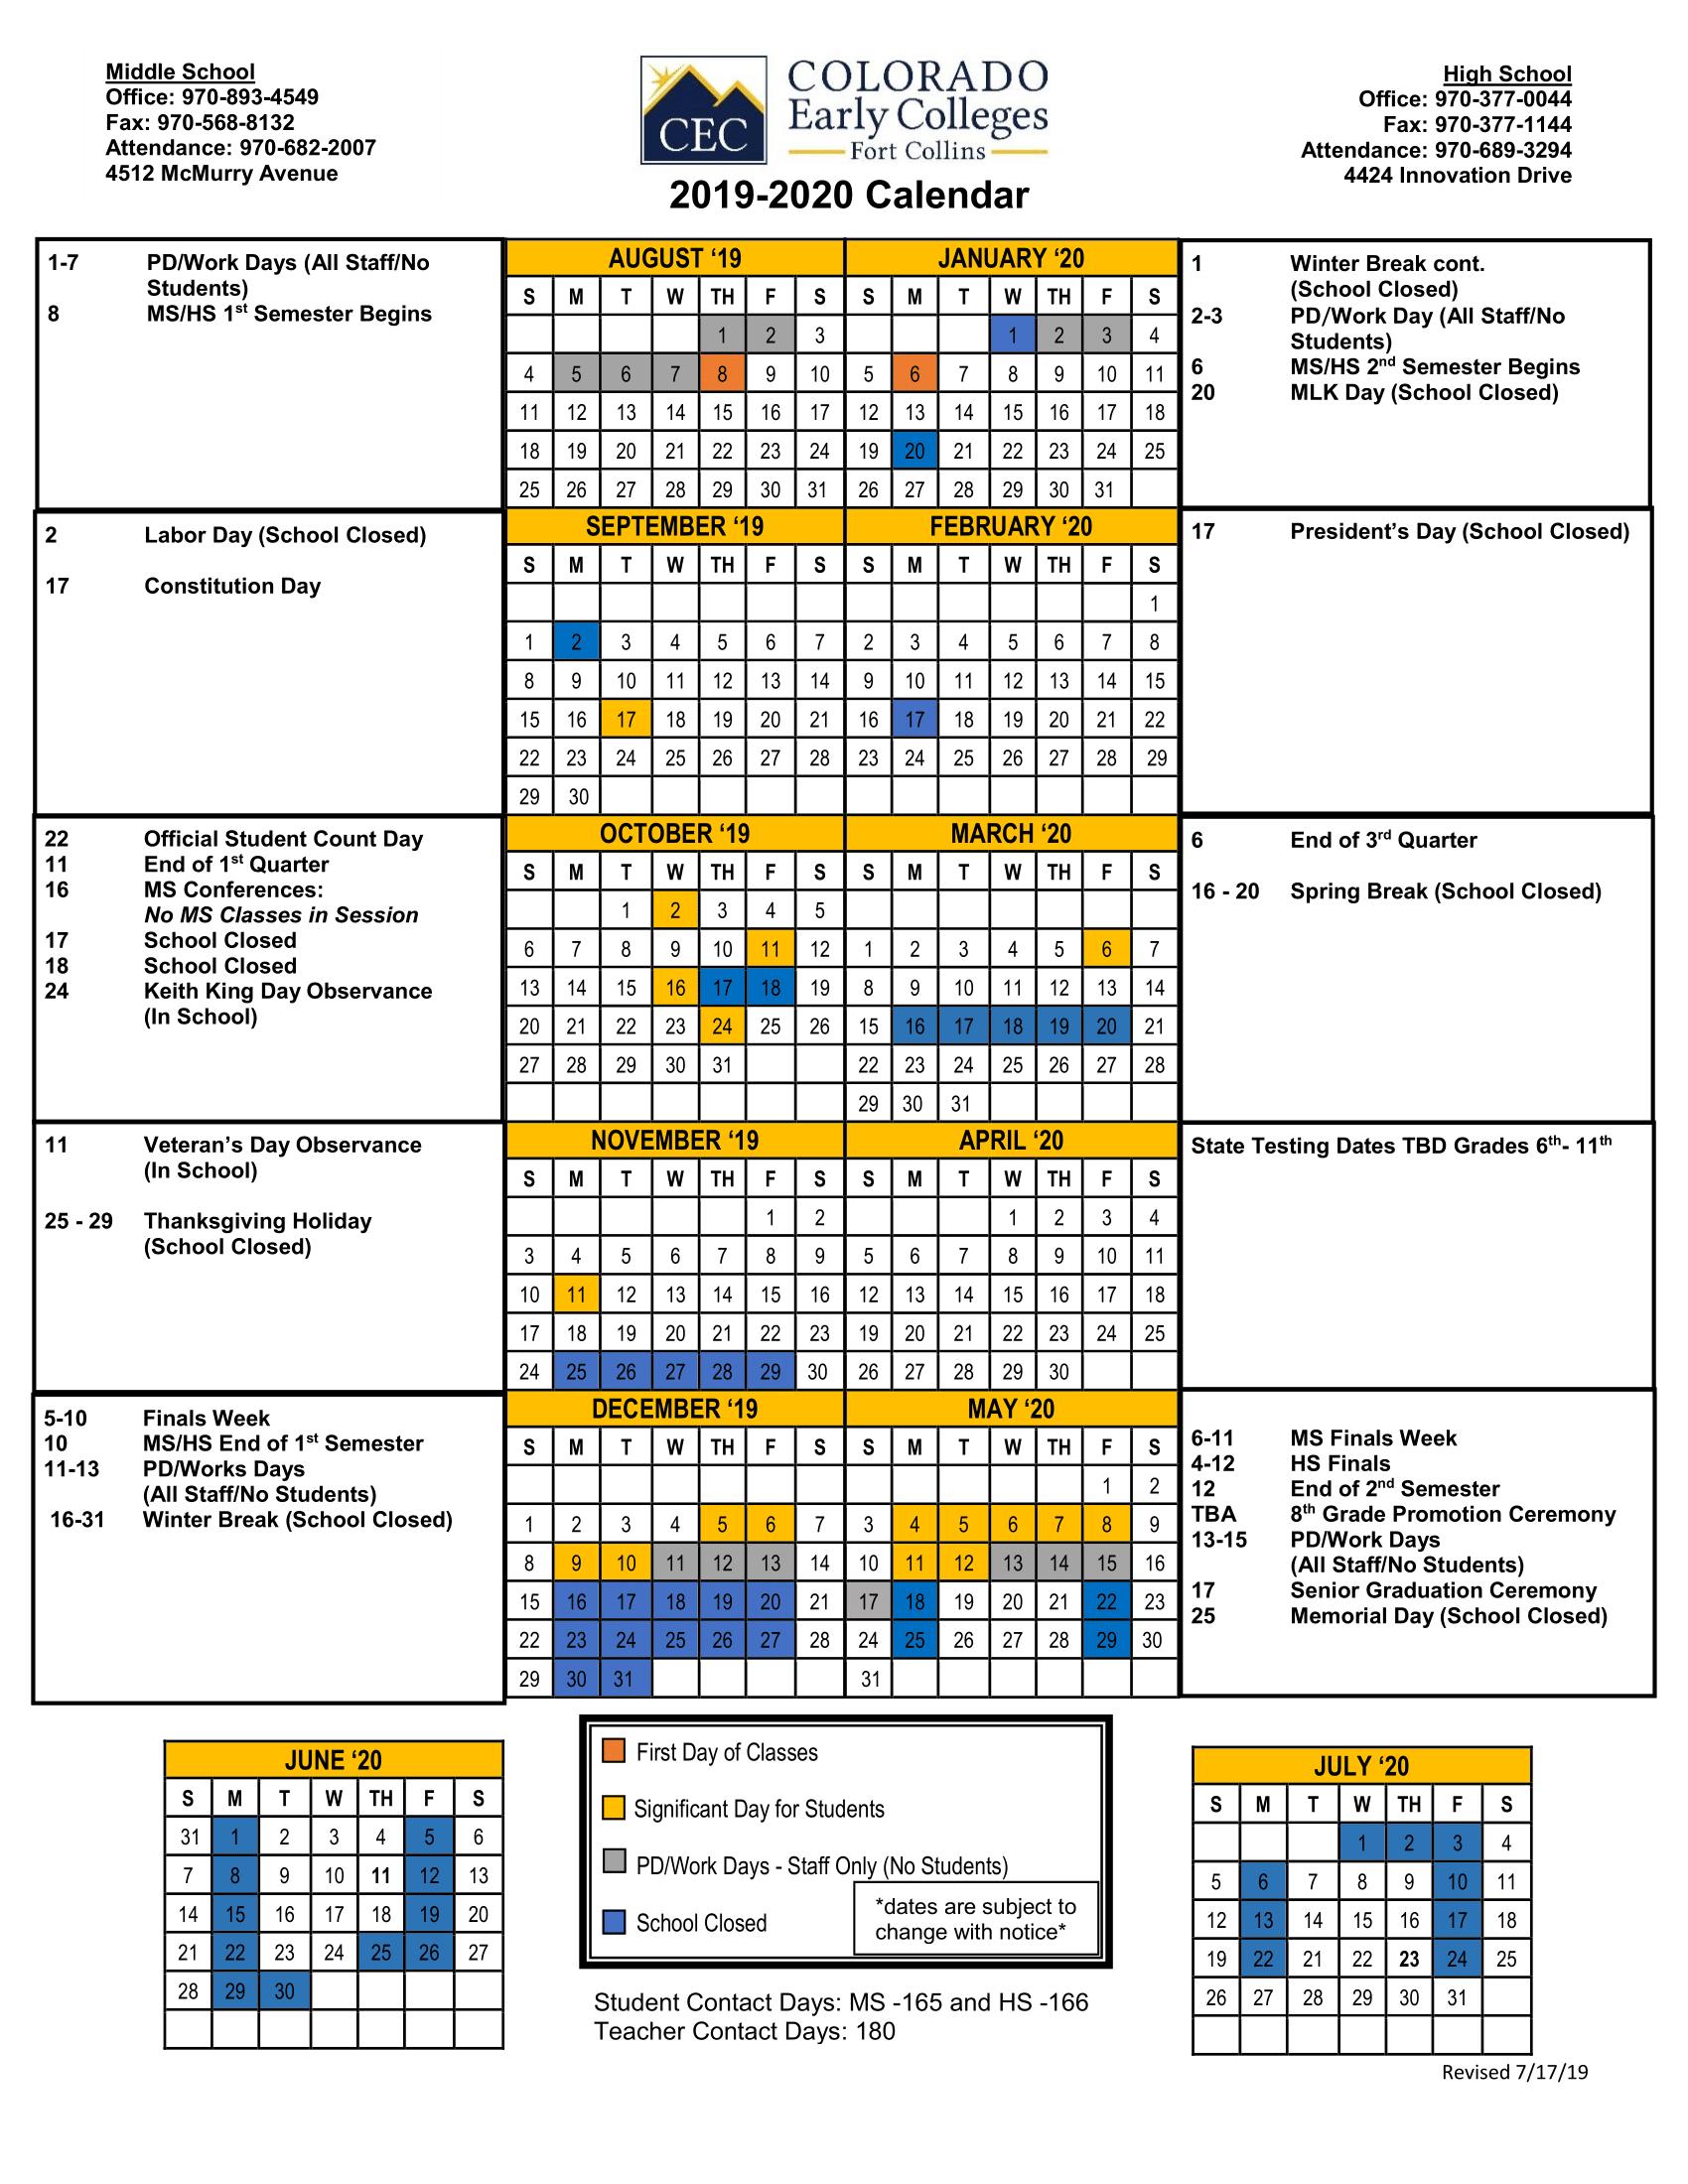 Official School Calendars - Miscellaneous - Cec Fort Collins With West Orange School District Printale Academic Schoool Schedule